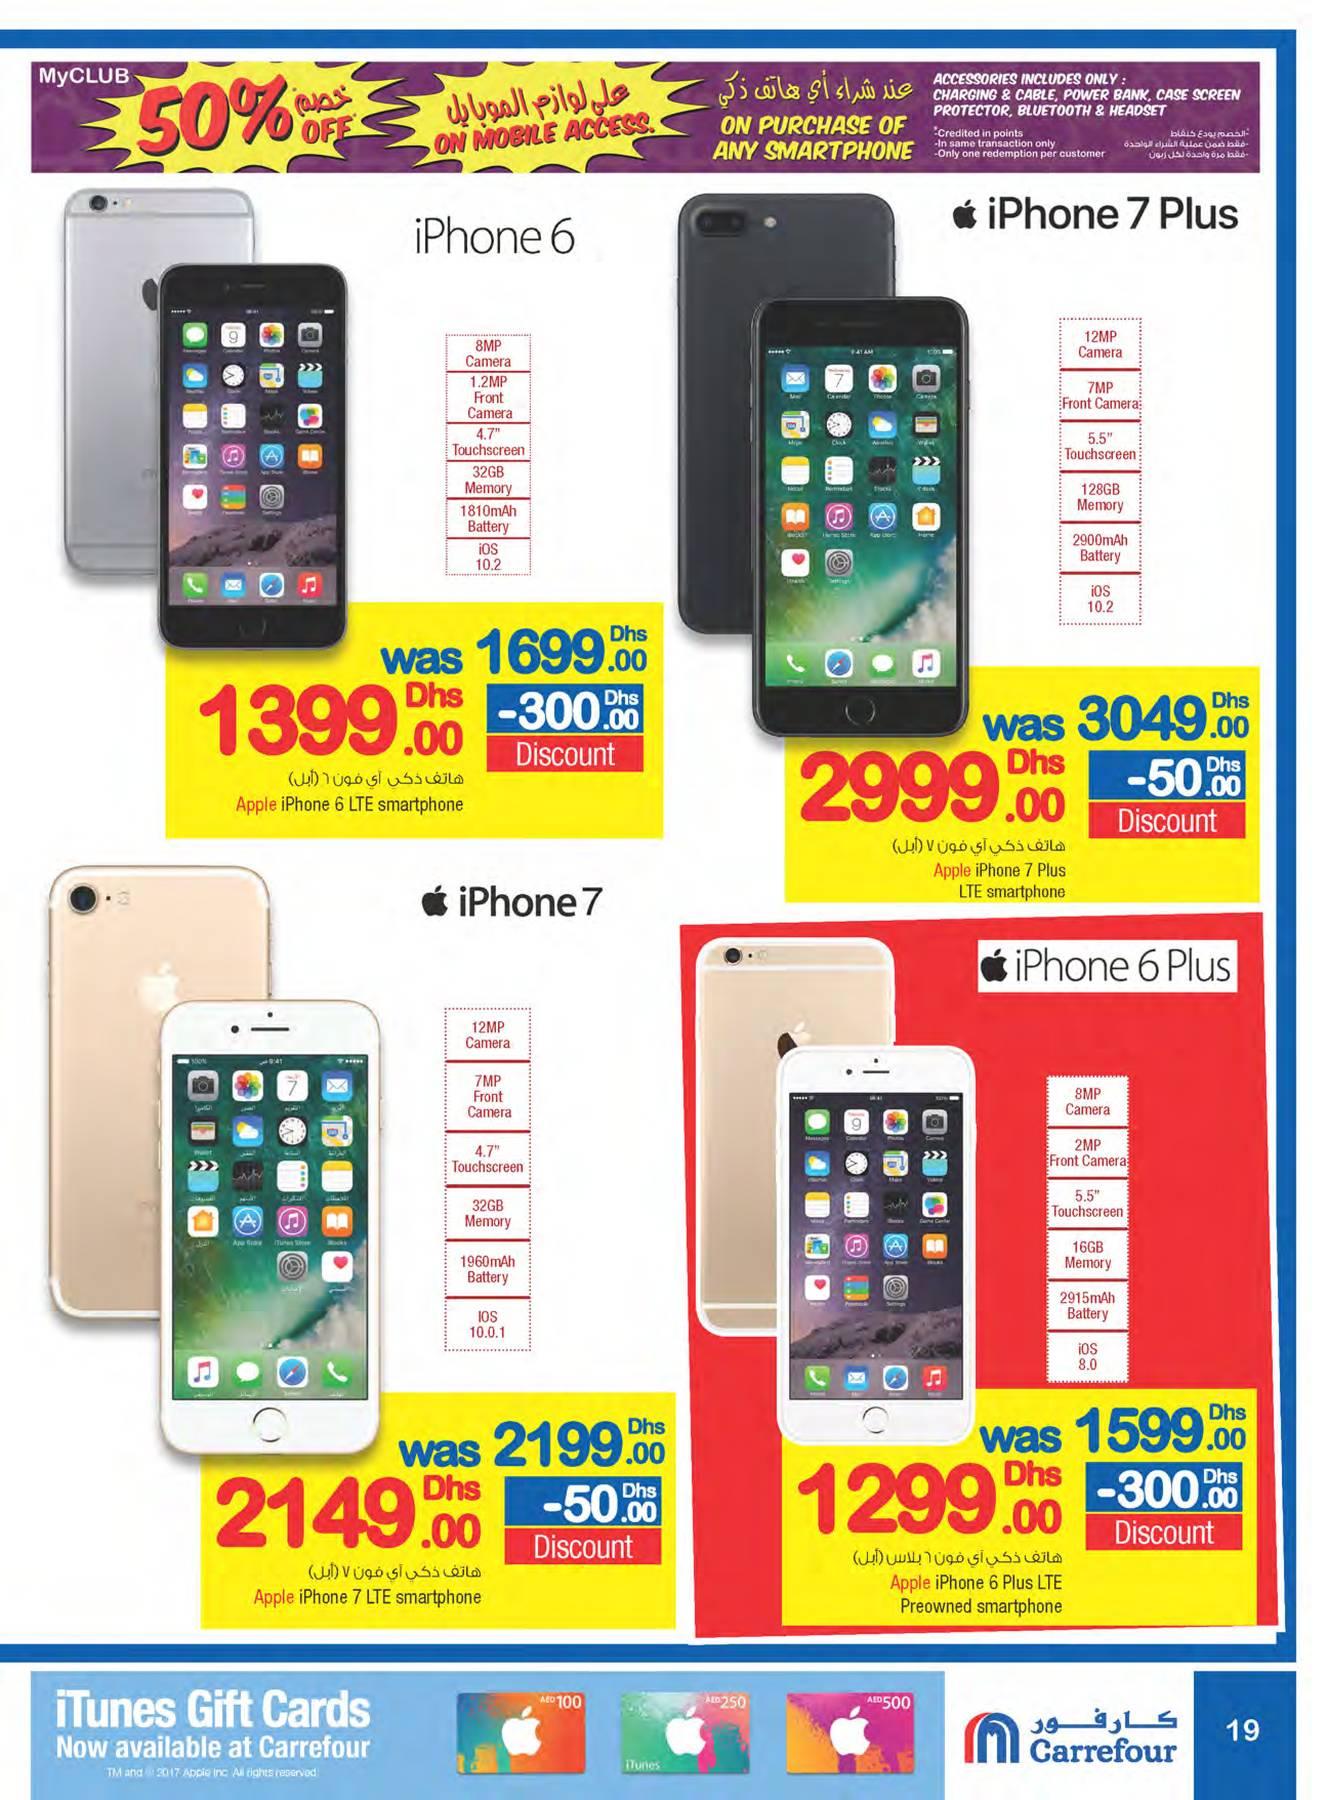 Iphone 6S Plus 128Gb Price In Uae Carrefour - gaurani almightywind info